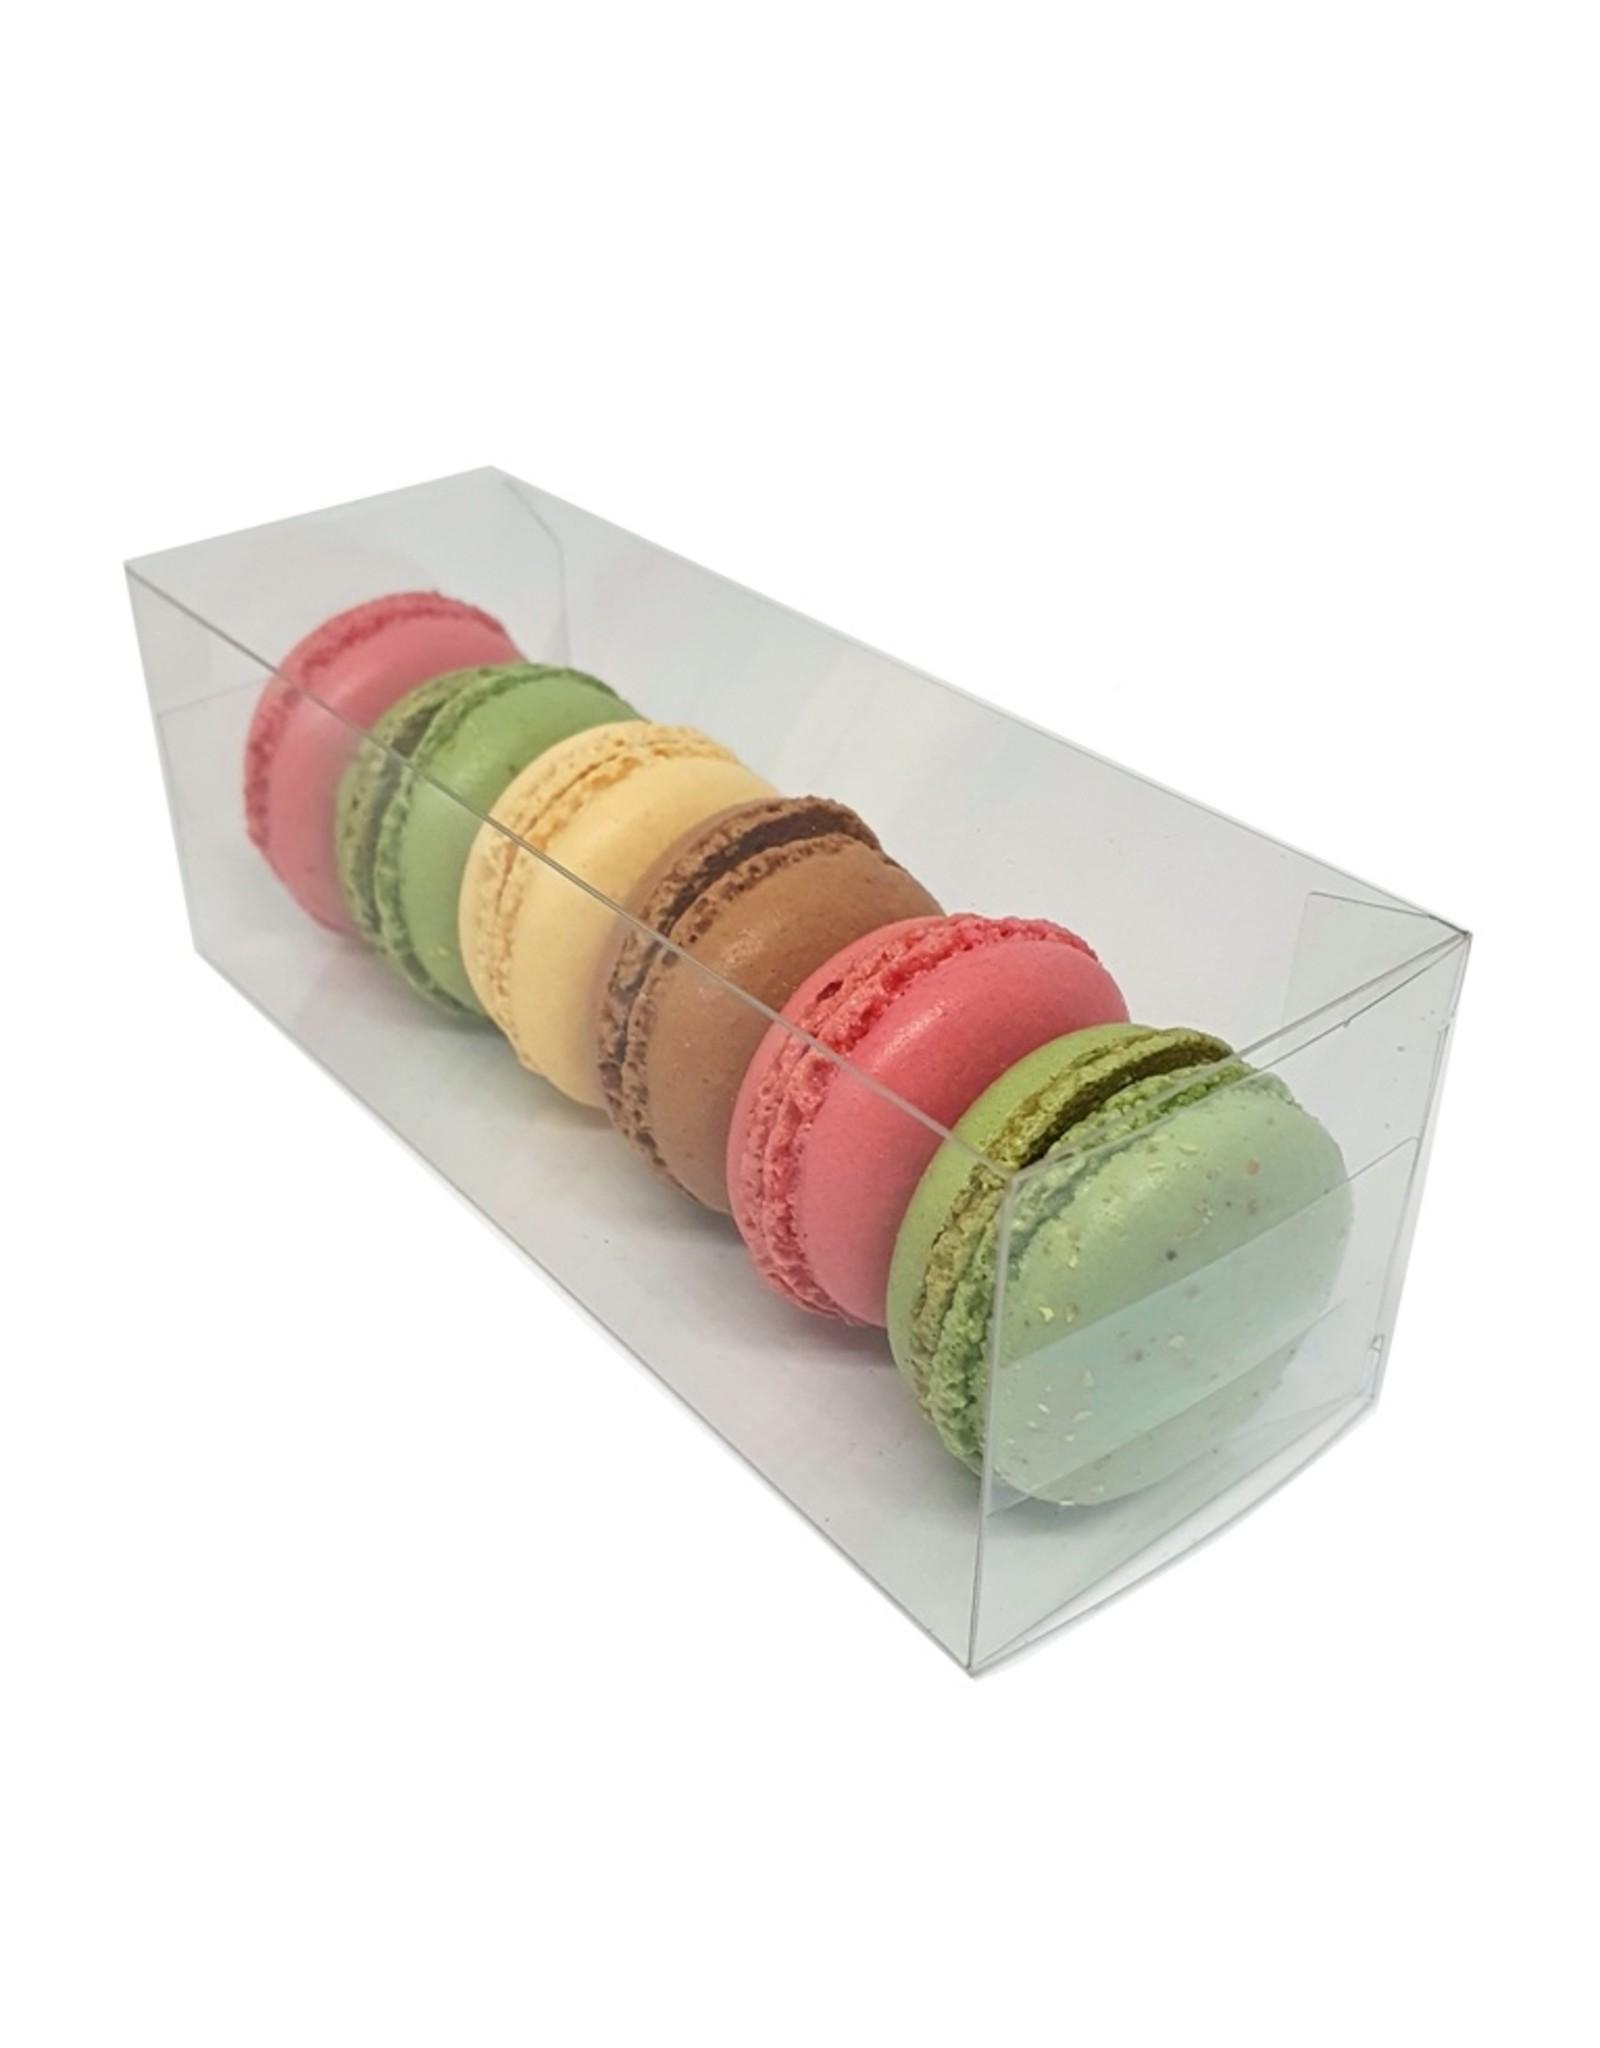 Box for macarons or cakepops (per 50 pieces)